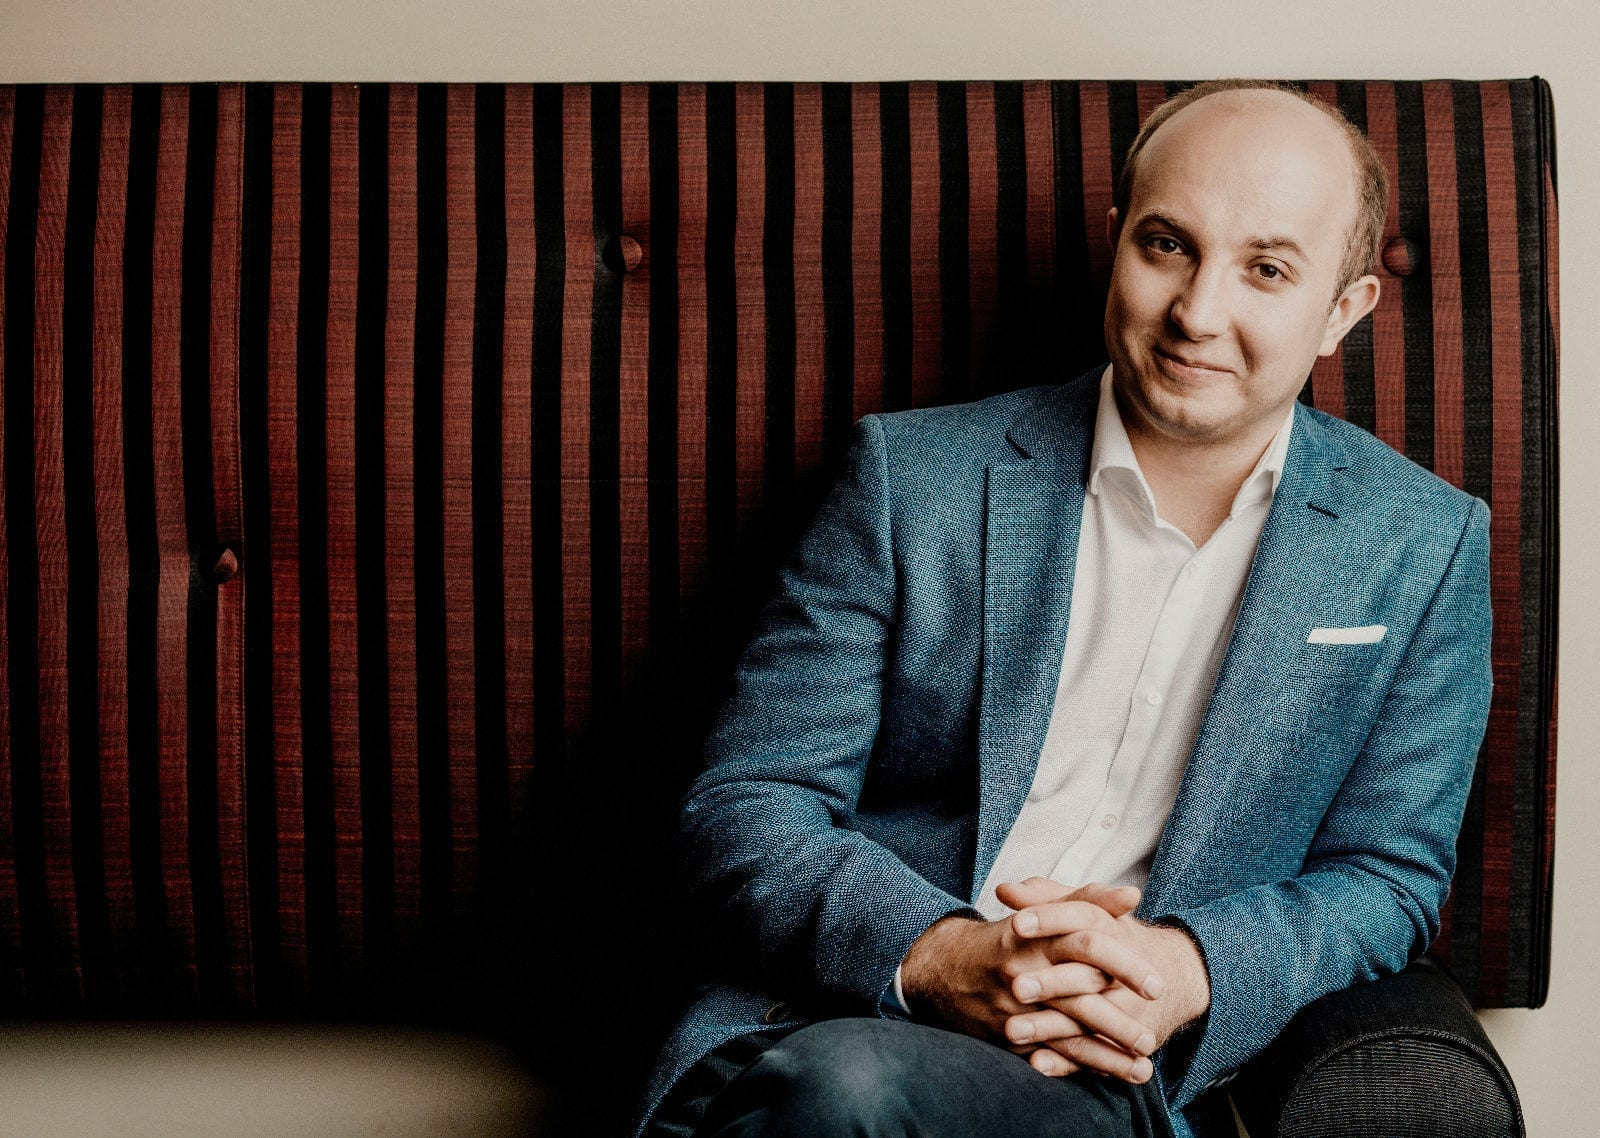 Amazon.com: Customer reviews: Alexander Gavrylyuk in Recital